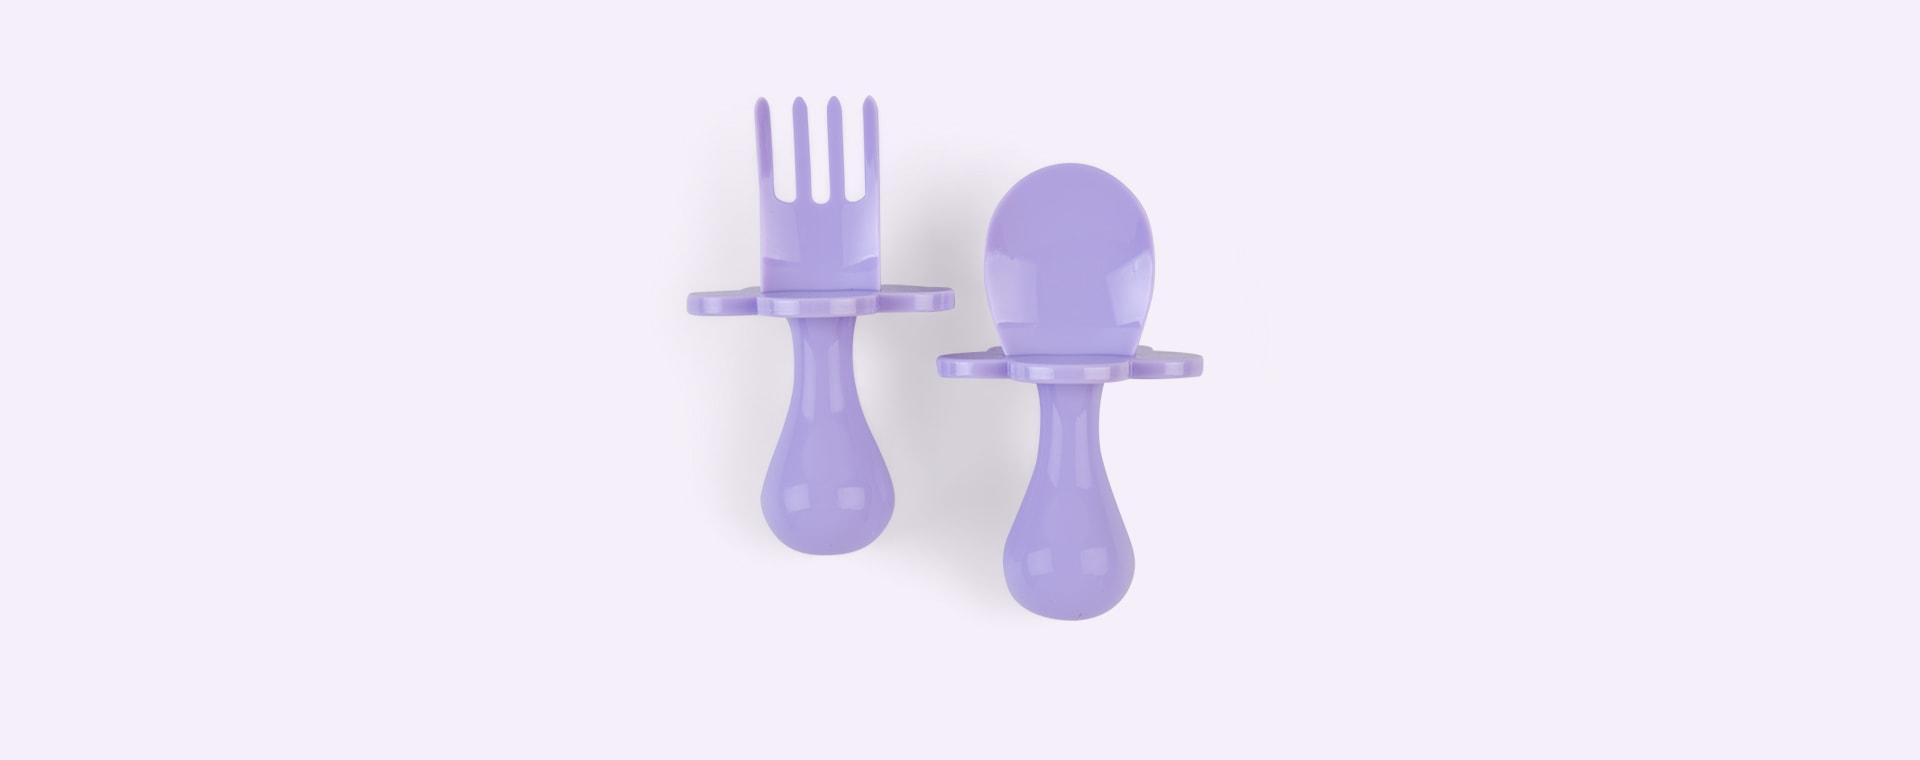 Lilac Grabease Cutlery Set